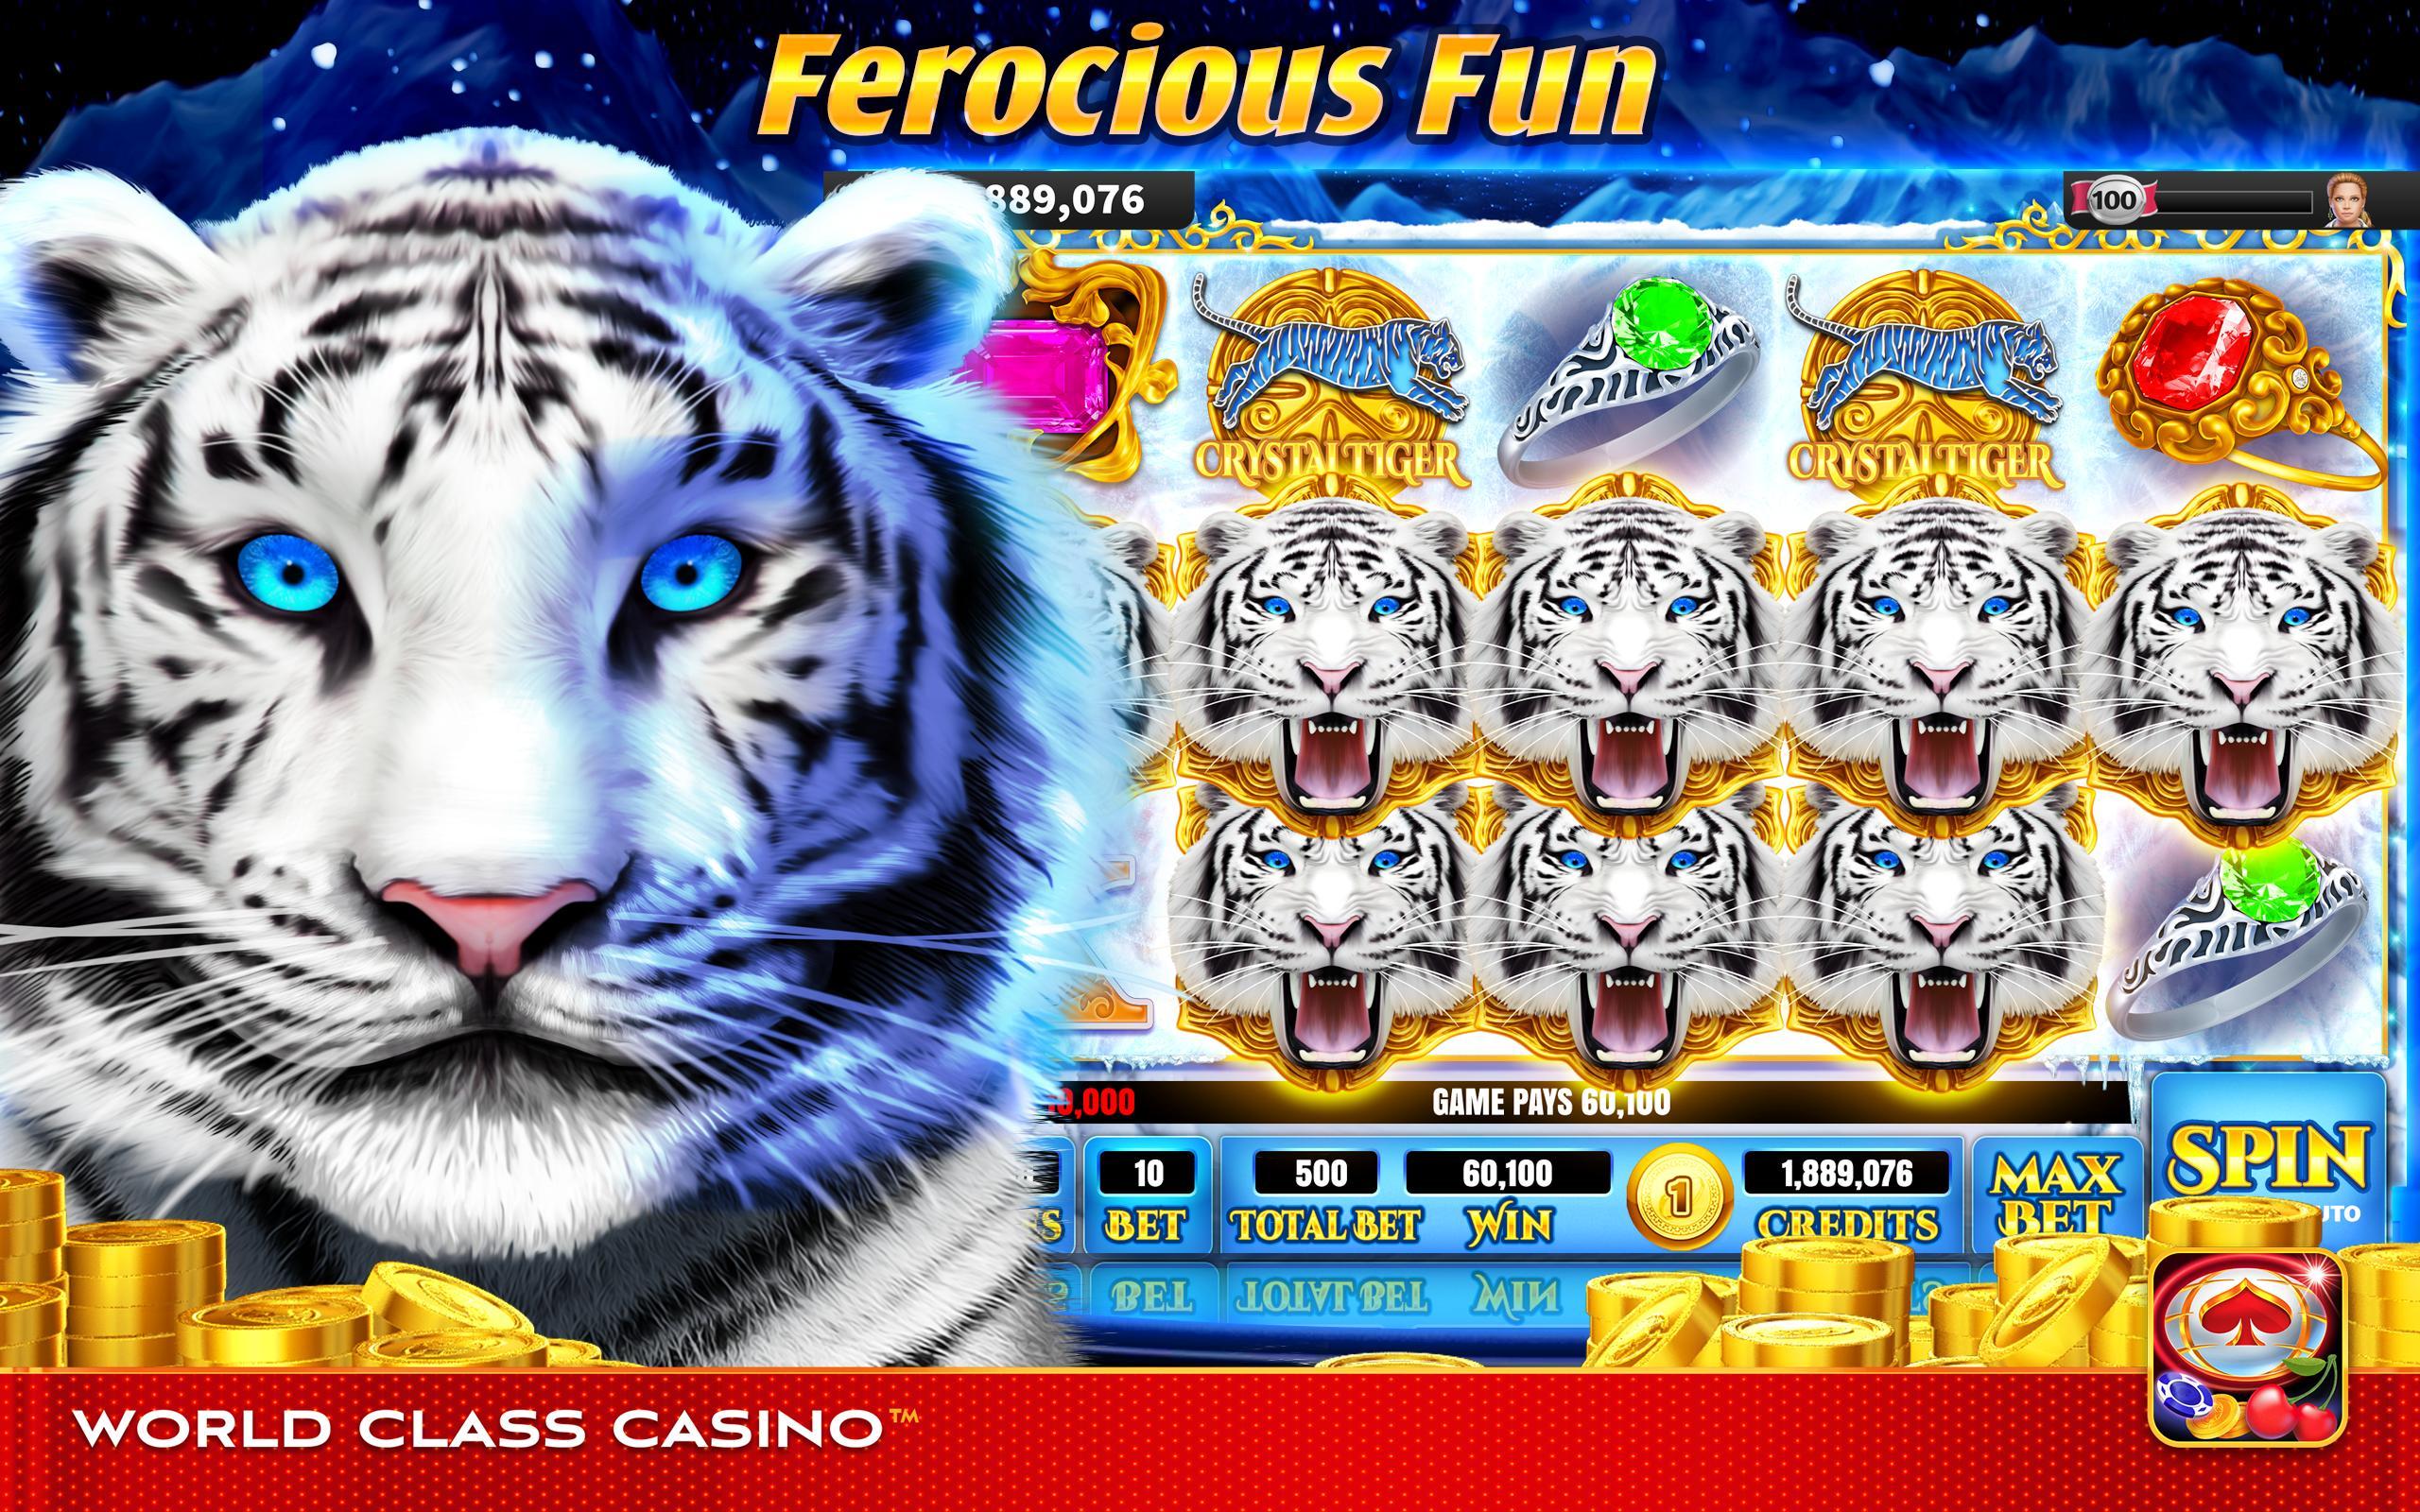 World Class Casino Slots, Blackjack & Poker Room 8.0.4 Screenshot 1